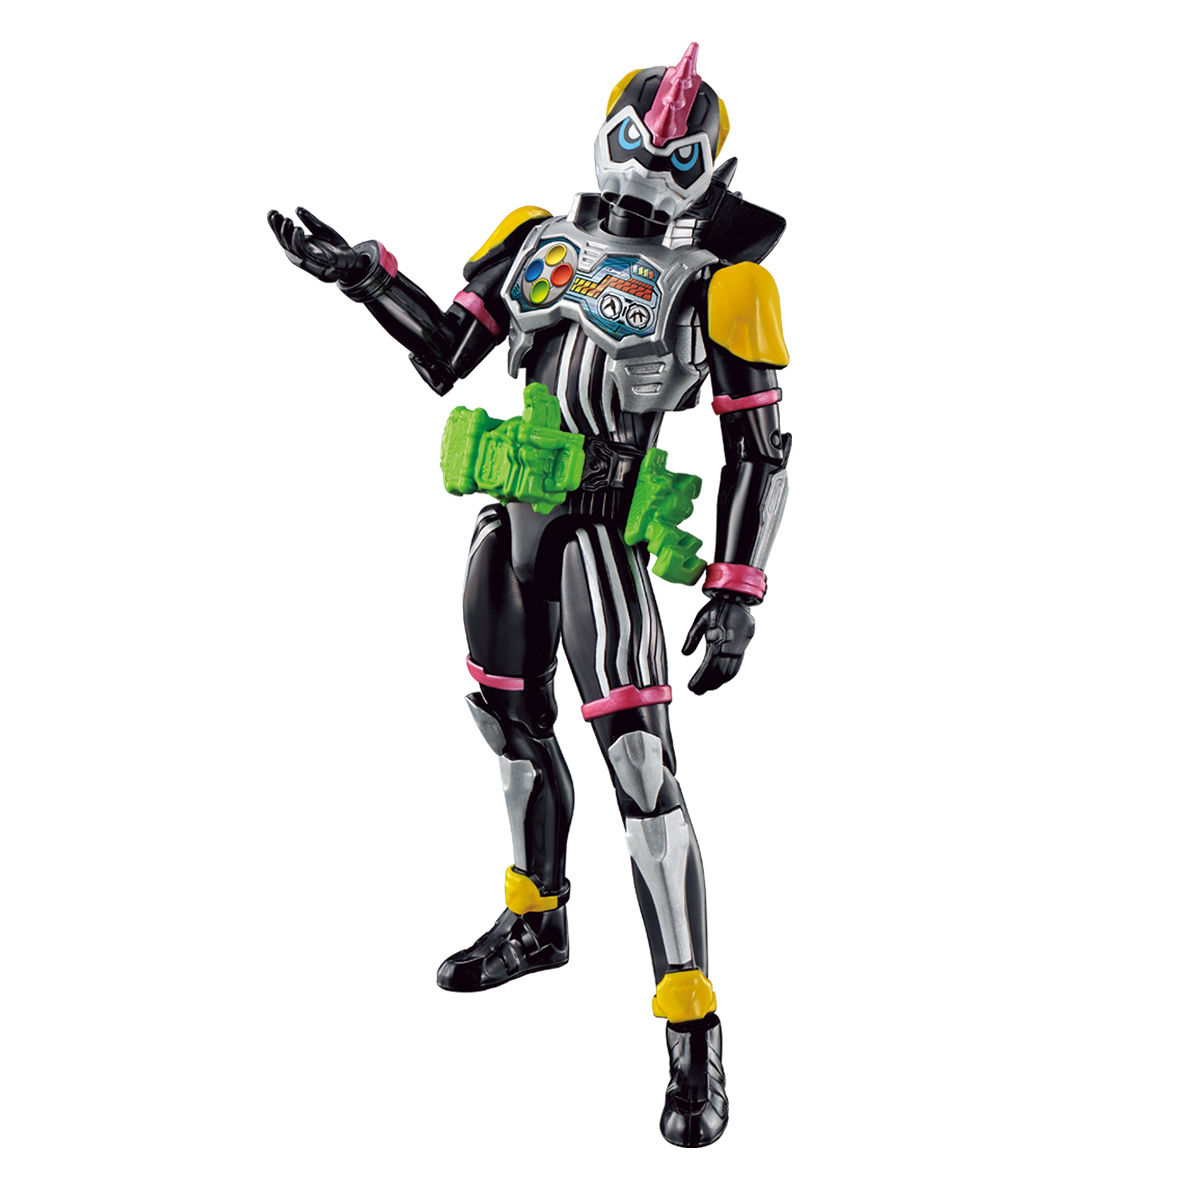 RKF RIDER KICK'S FIGURE 仮面ライダーレーザーターボ バイクゲーマー レベル0